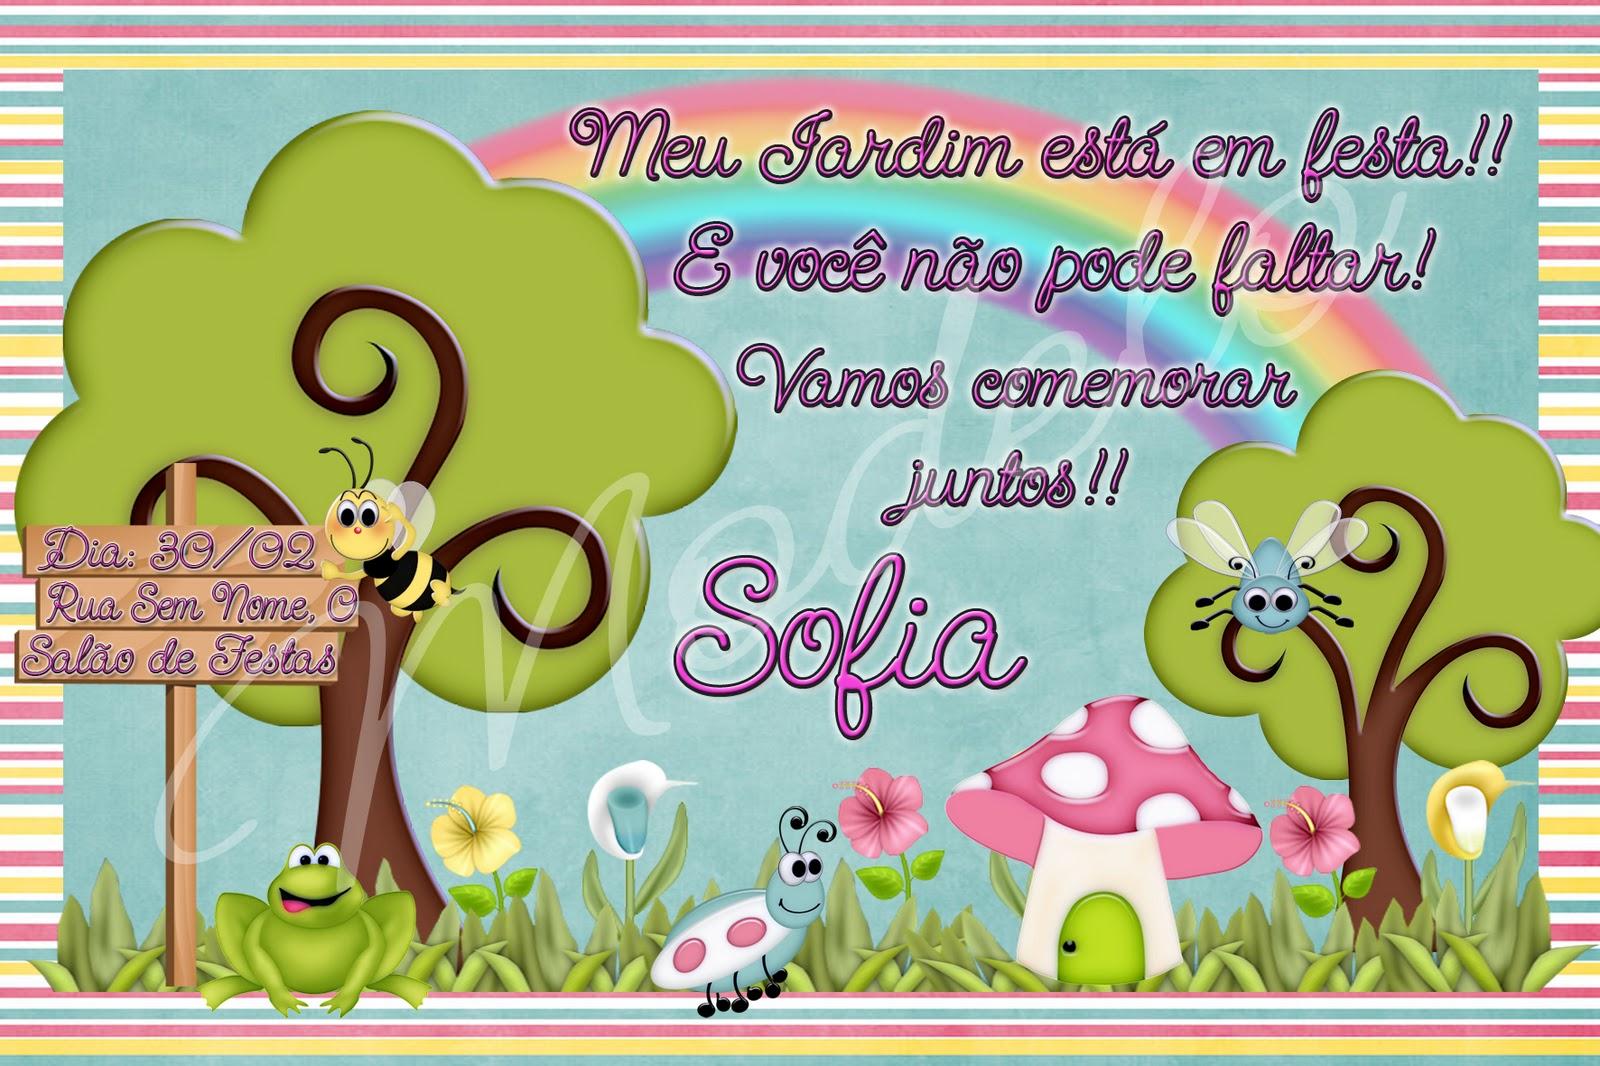 festa jardim convite : festa jardim convite:ʚɞ..ʚɞ Little Art Festasʚɞ..ʚɞ: Convite Infantil – Jardim